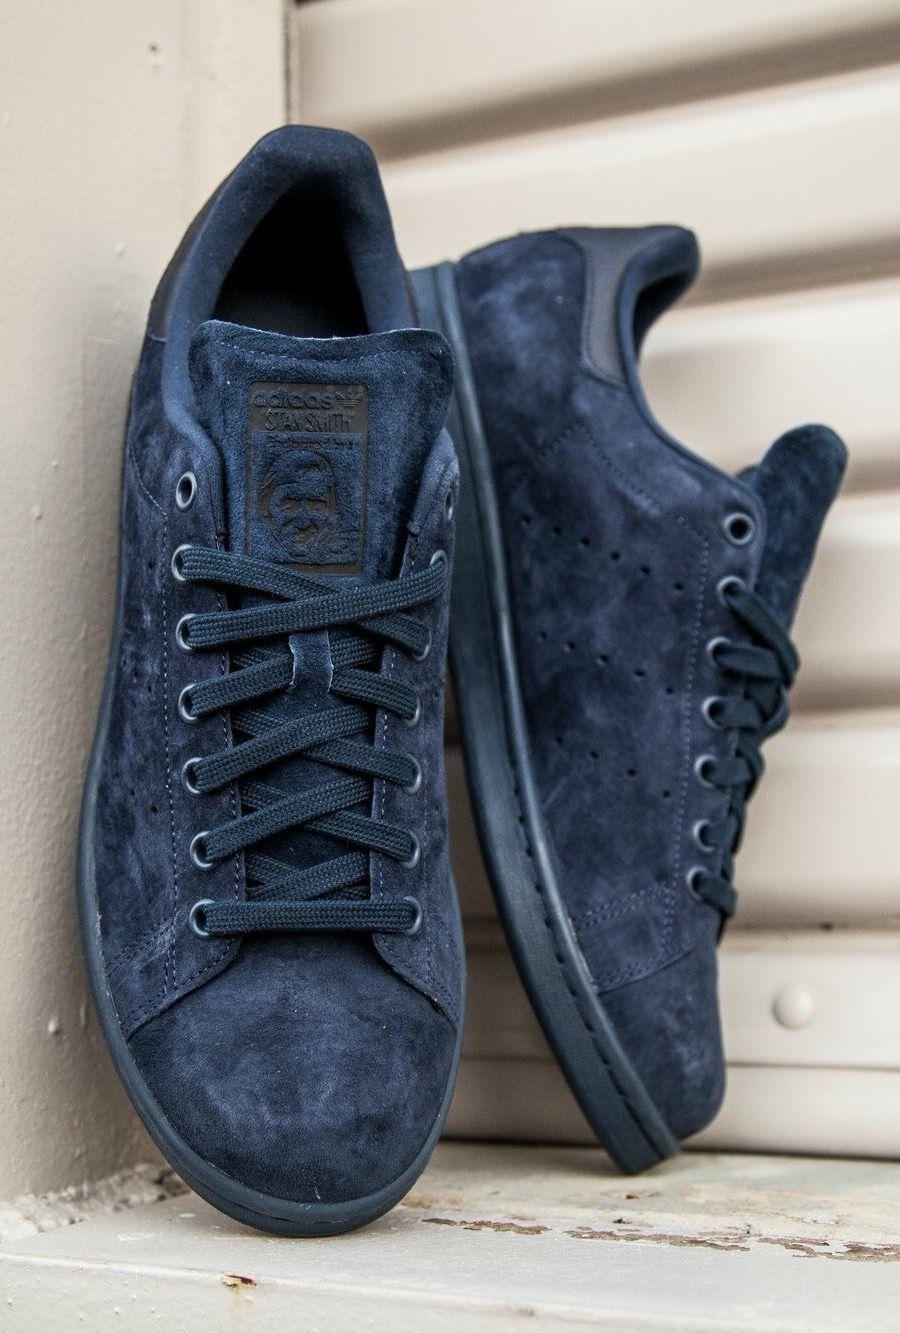 jordanshoes18 on in 2019 | Adidas shoes women, Adidas women